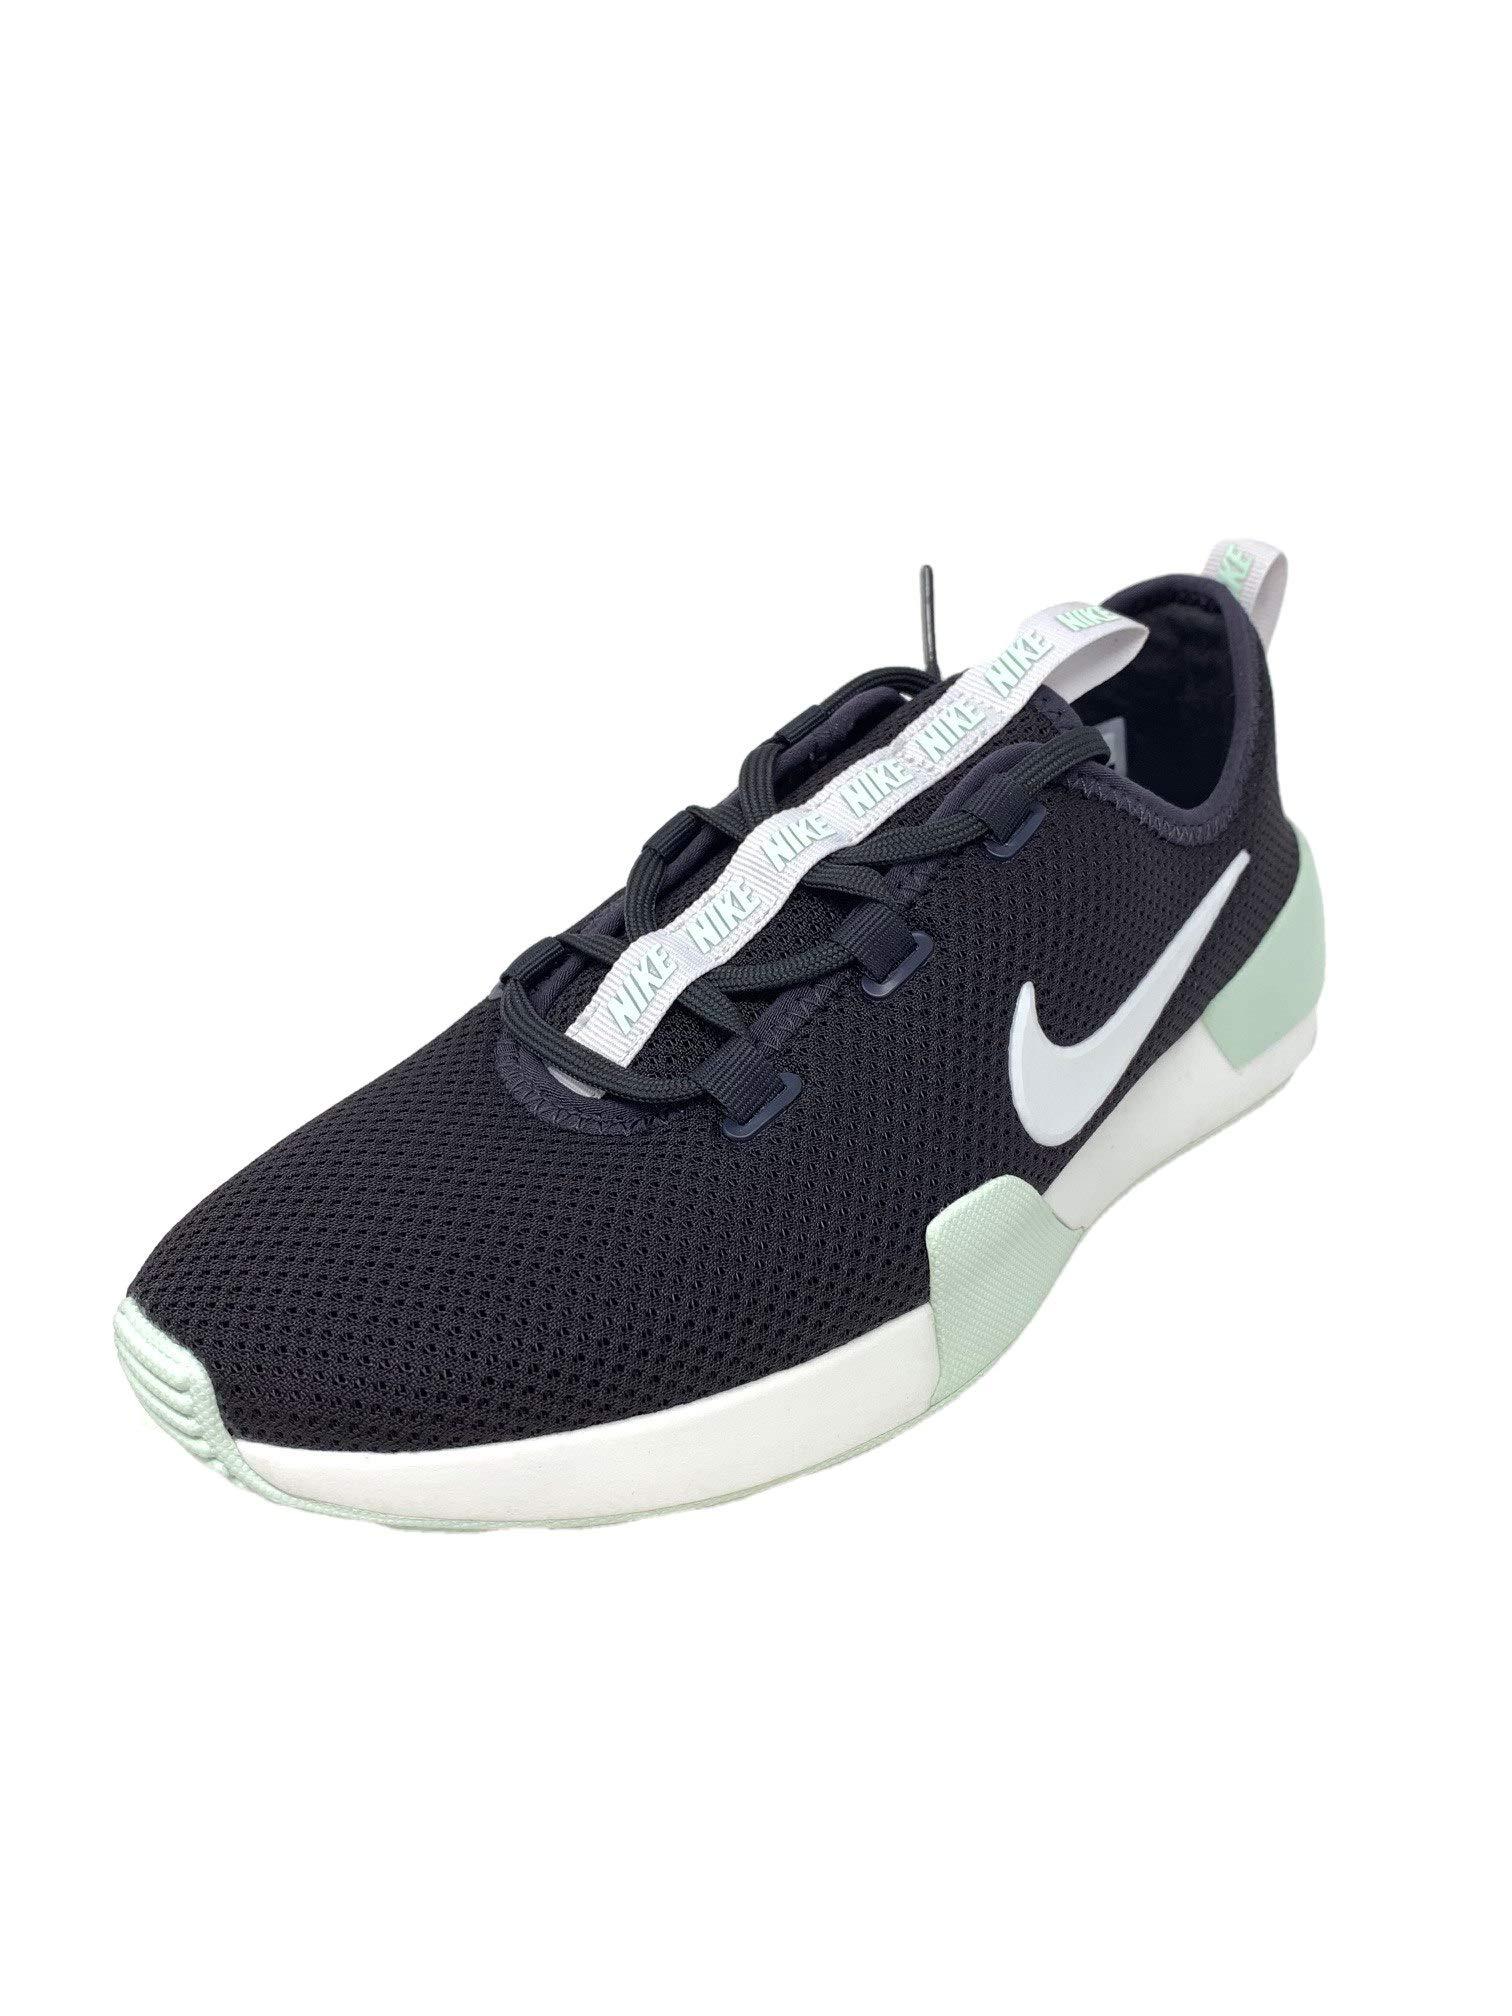 6fcf939bbaaf3 Nike Women's Ashin Modern Run Shoe, Oil Grey/Summit White/Igloo/Vast Grey,  10